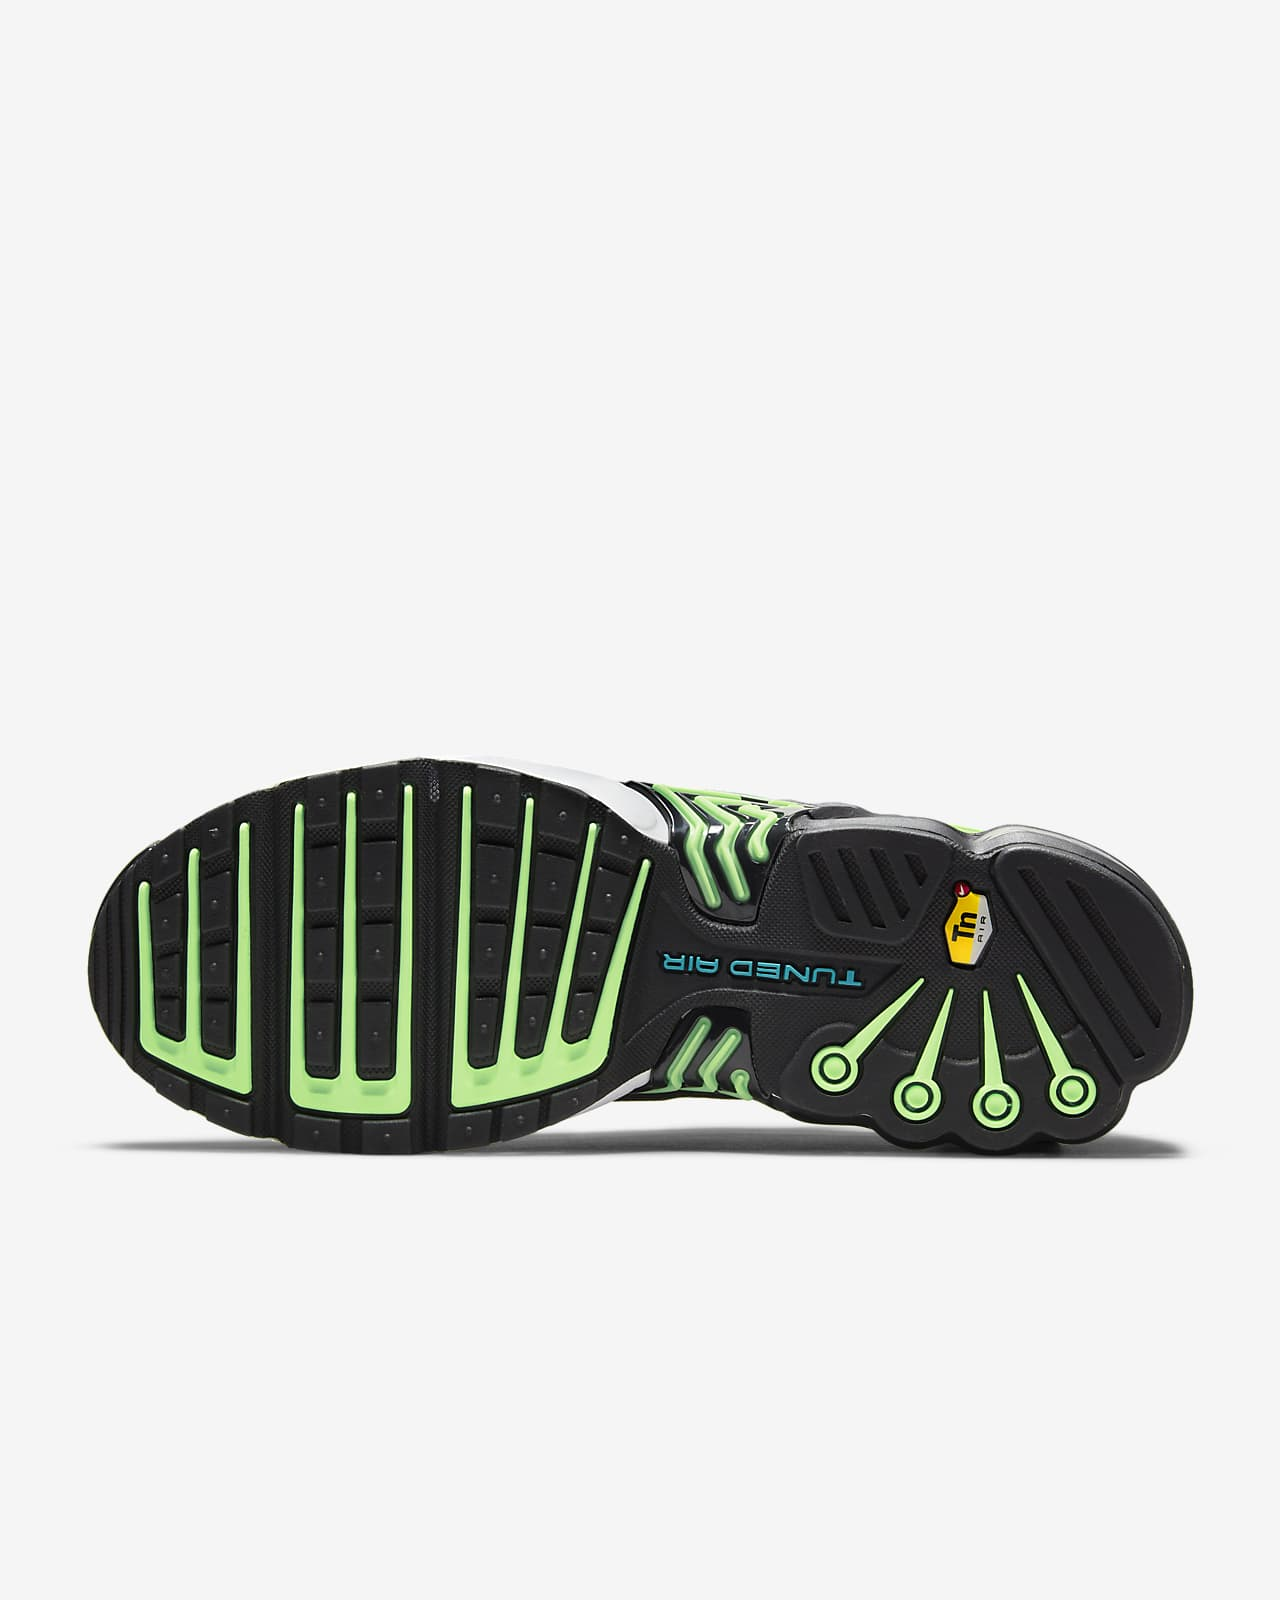 Nike Air Max Plus 3 Men's Shoes. Nike HR